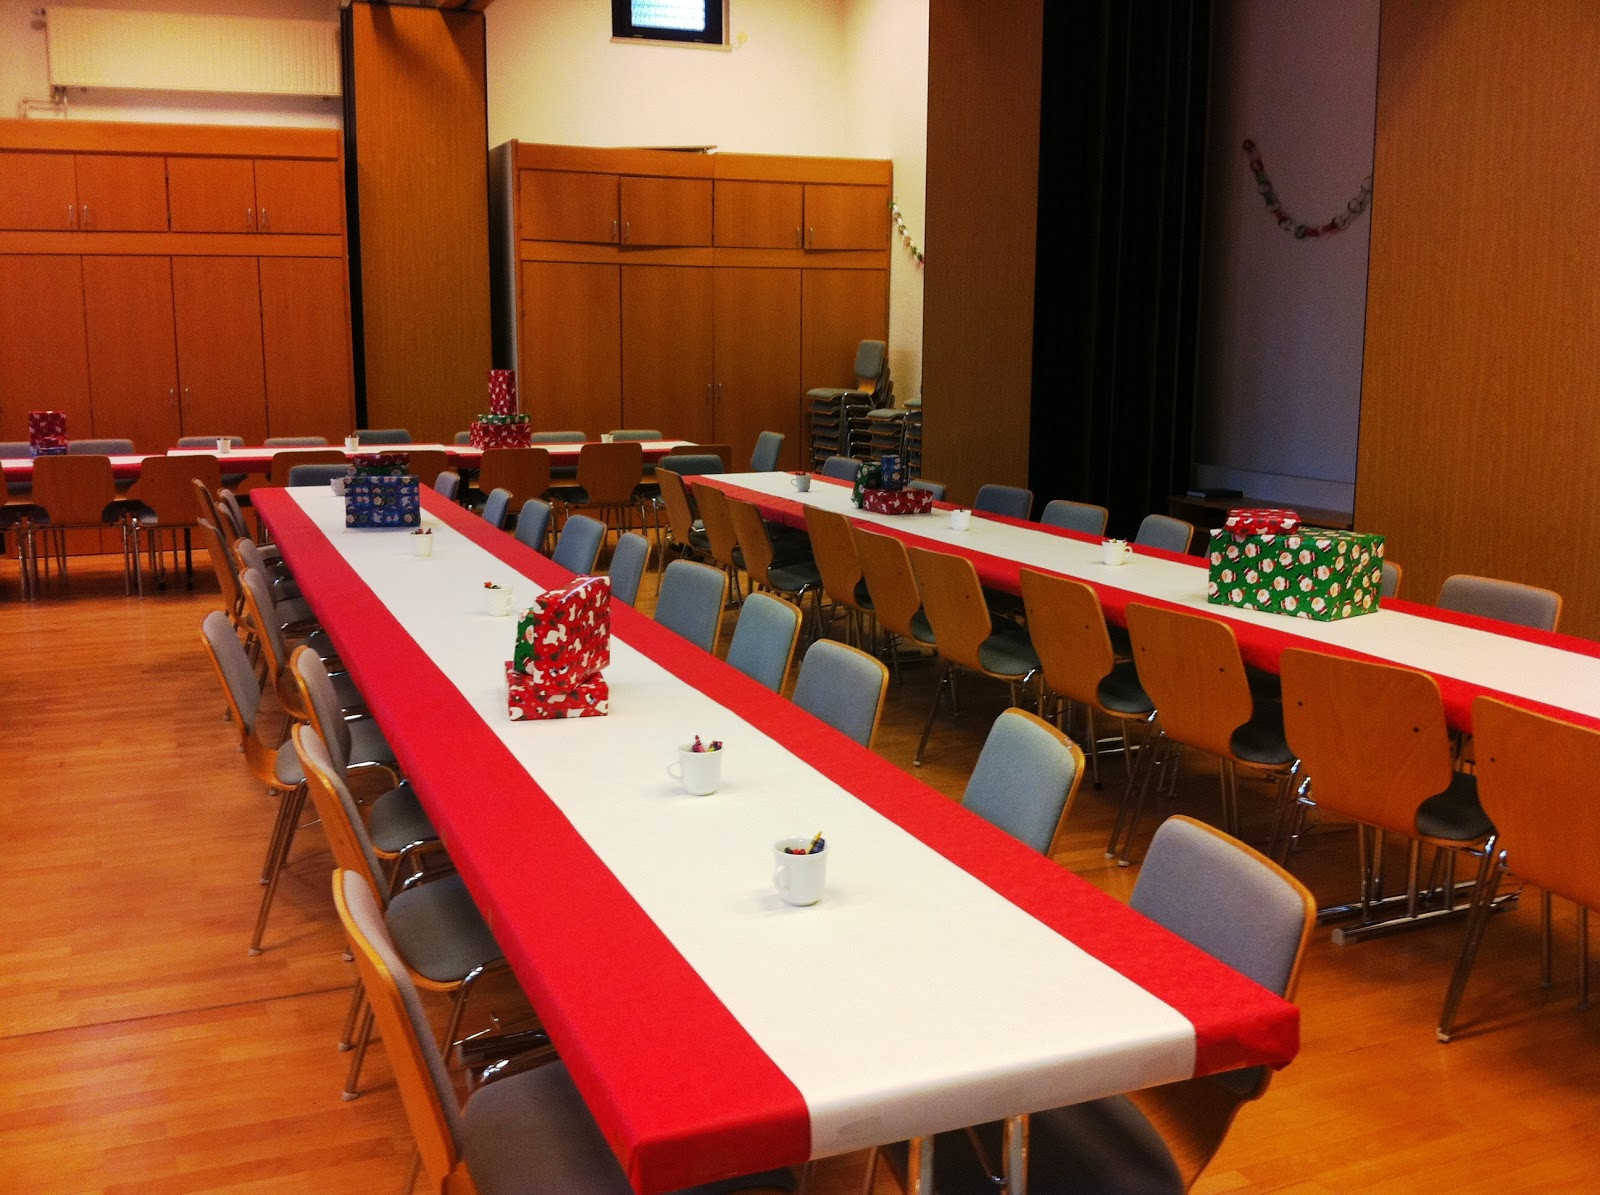 Church Christmas Party Ideas  The Pethel Family Church Christmas Party